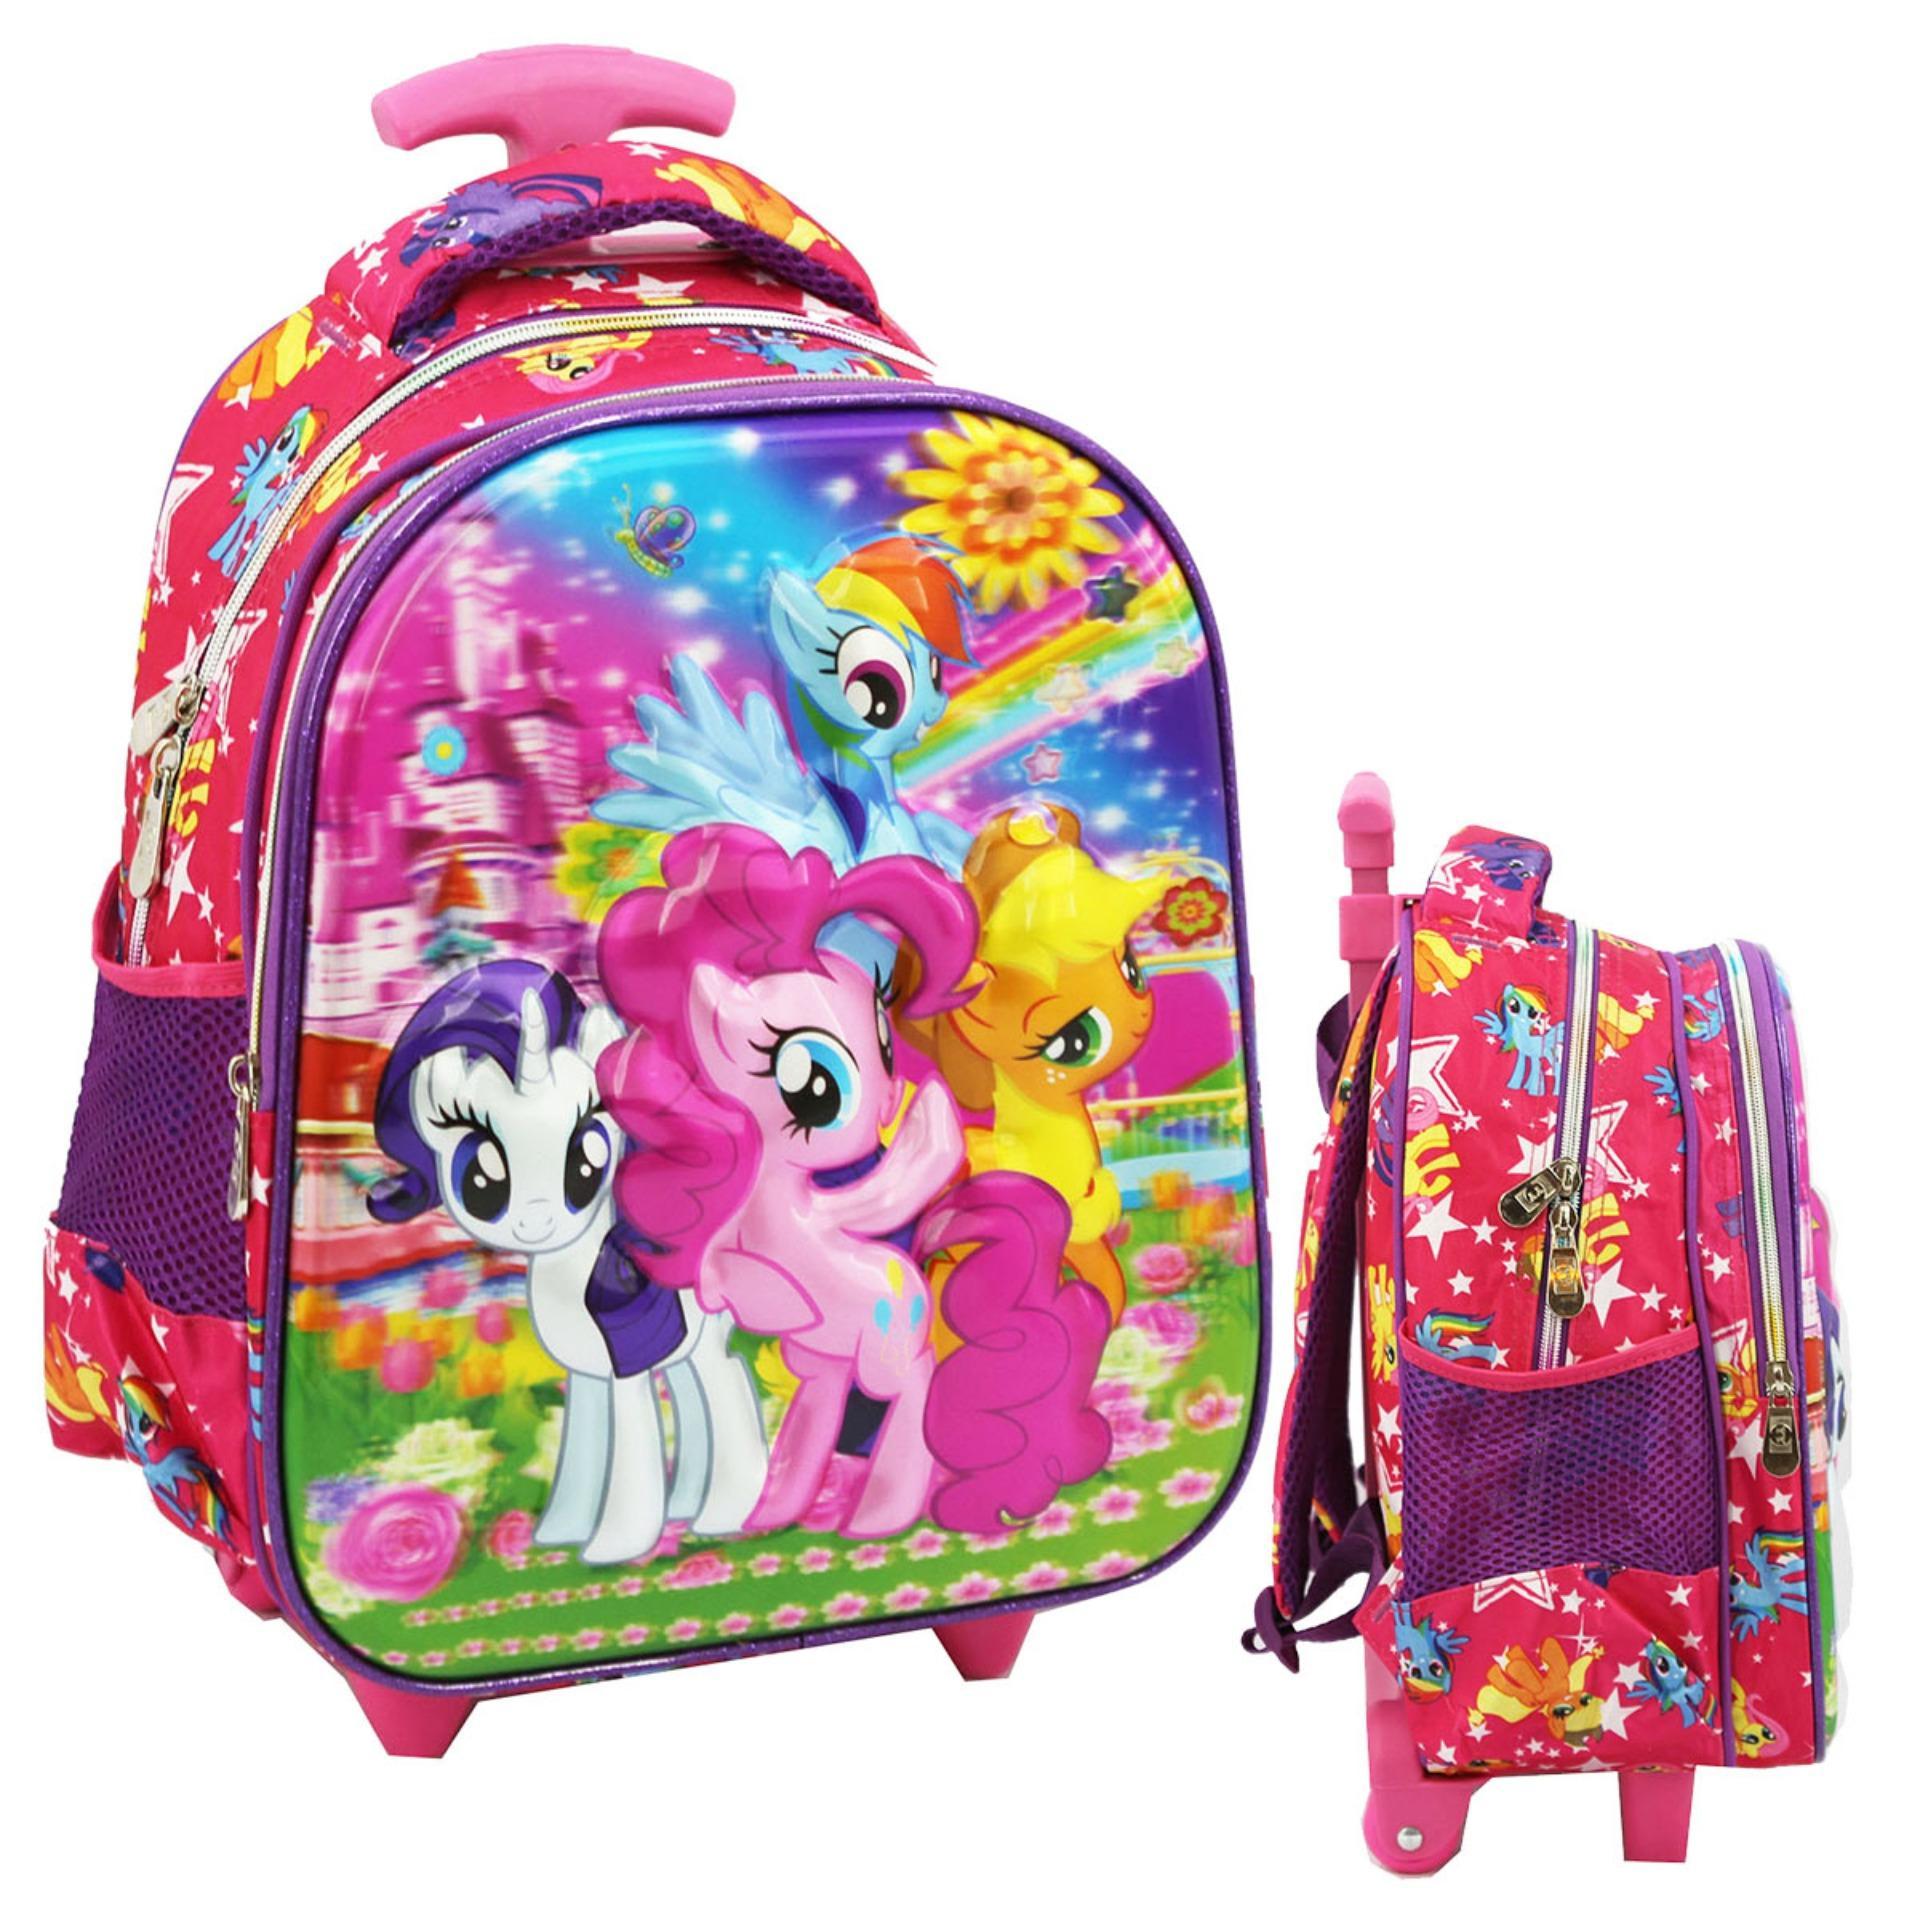 Toko Onlan My Little Pony Flower 5D Timbul Hologram Tas Anak Sekolah Tk Murah Dki Jakarta